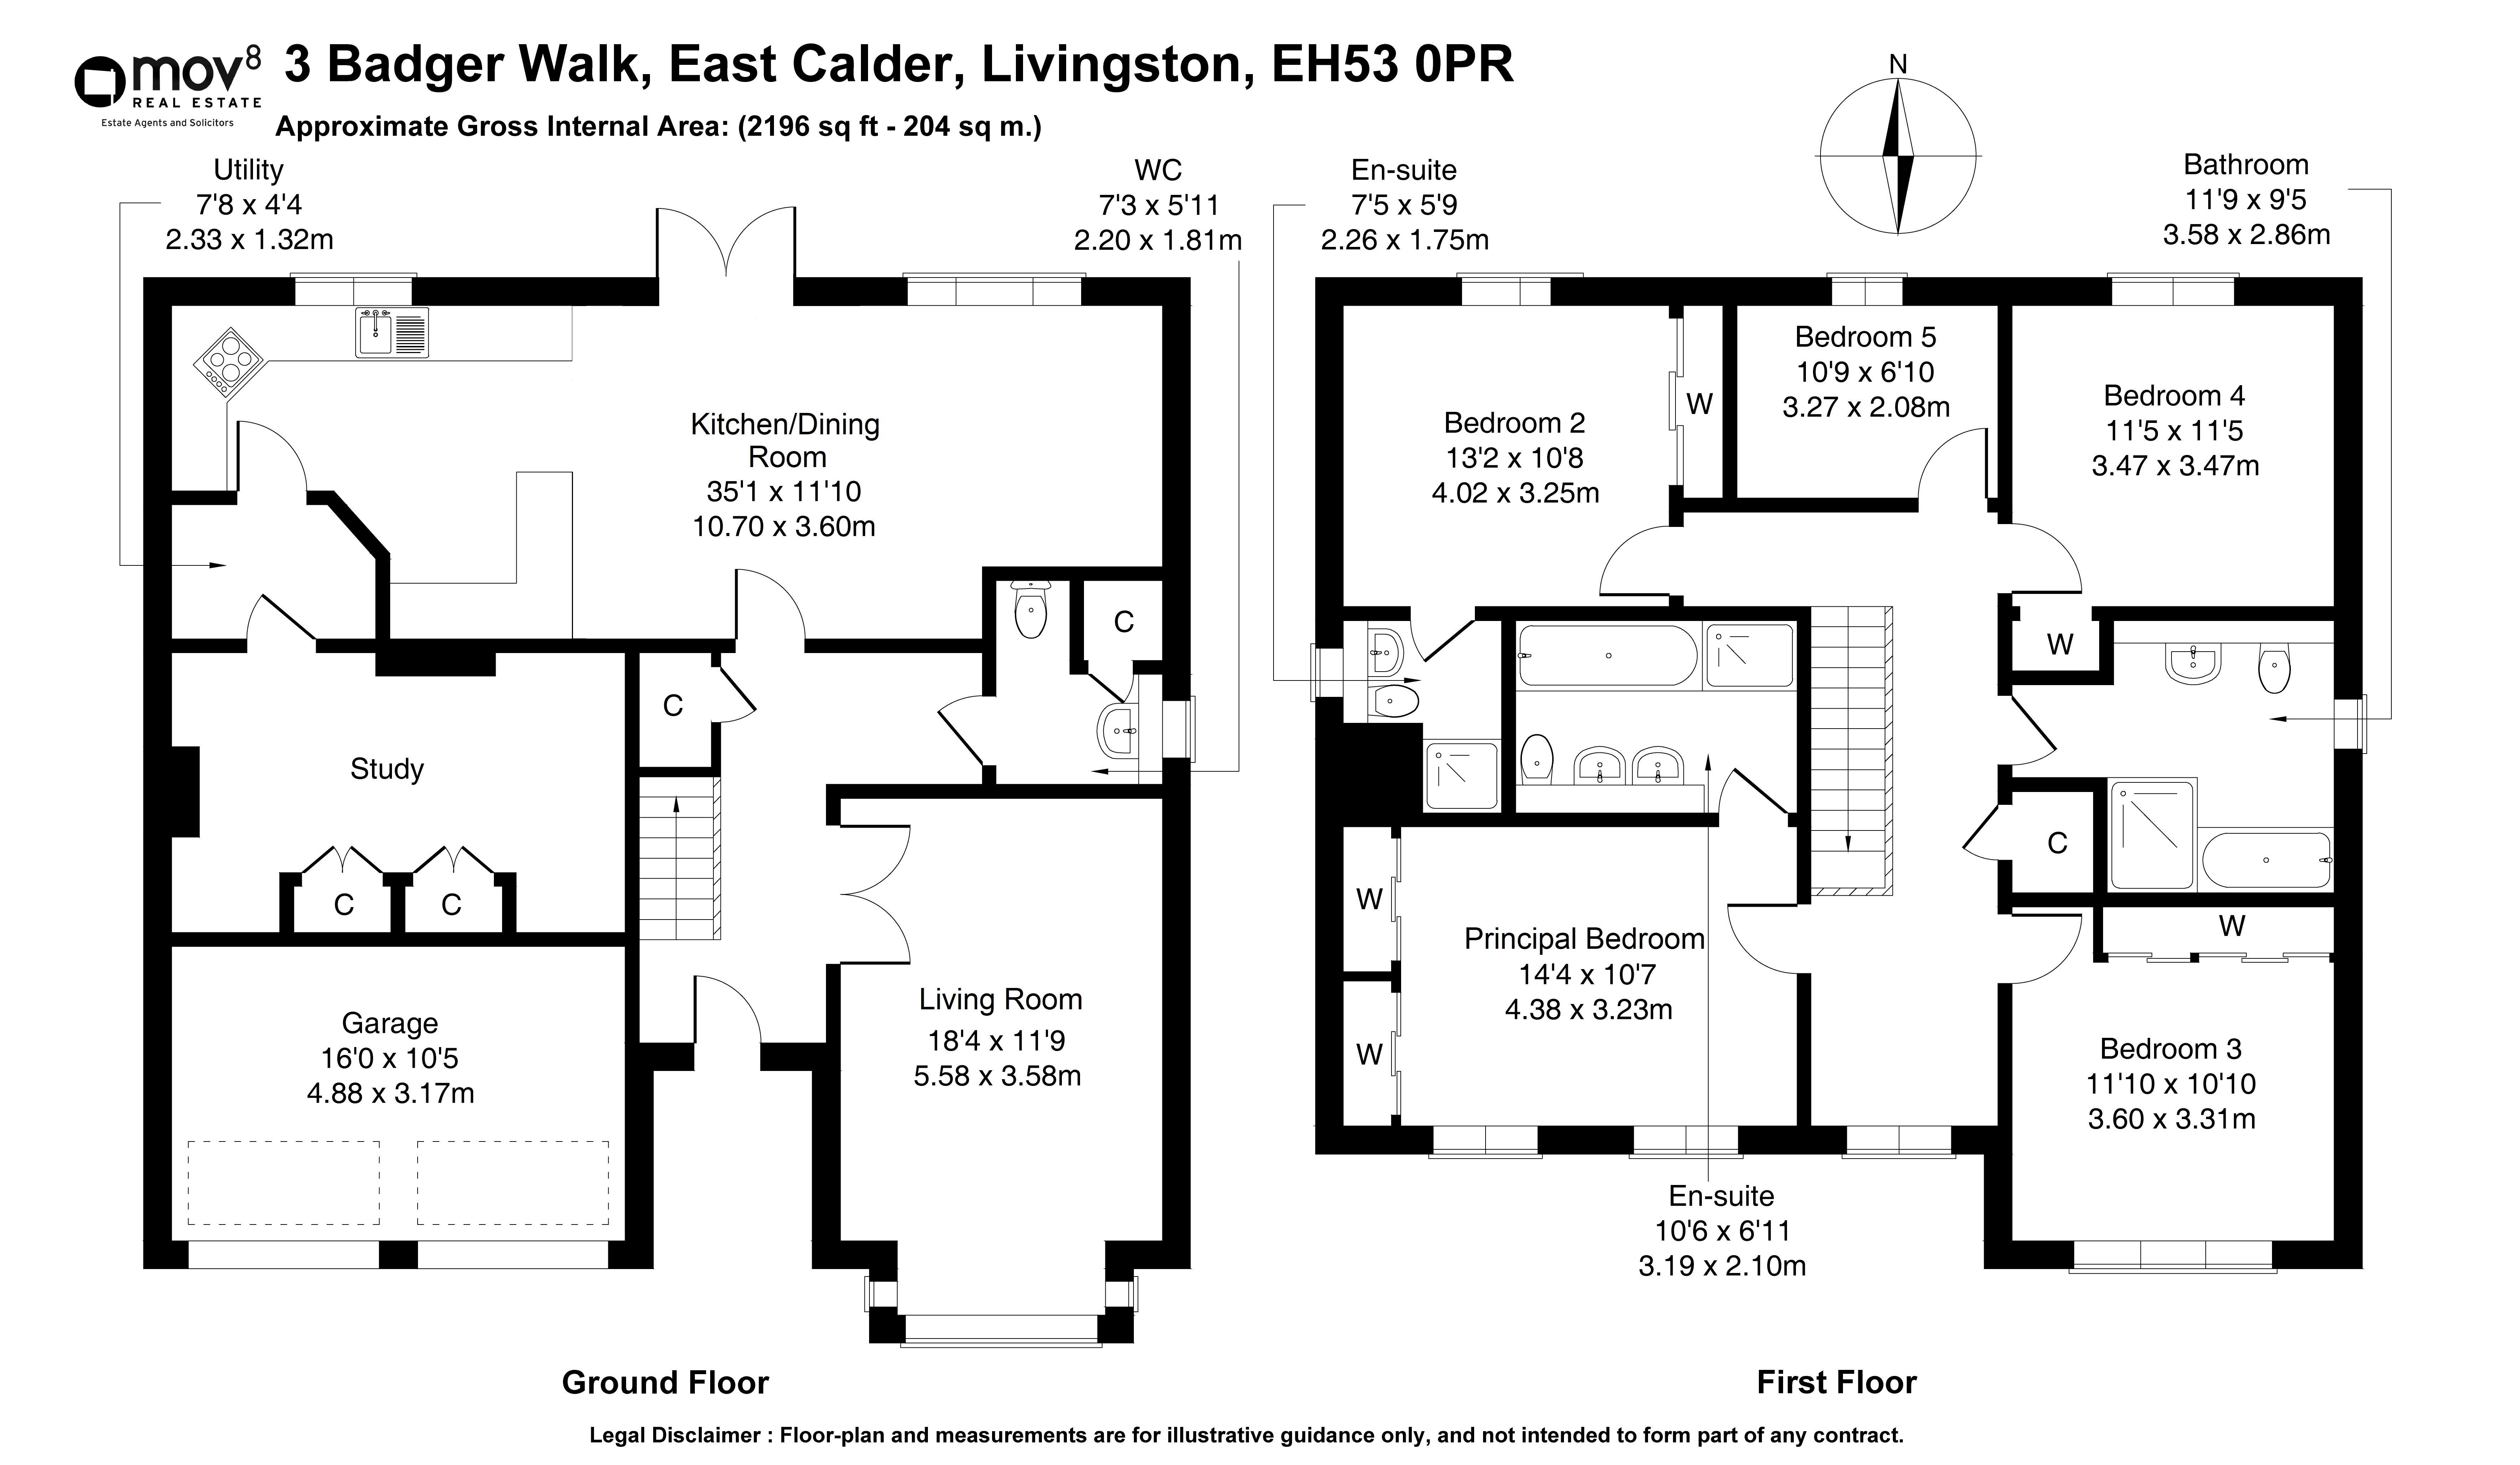 Floorplan 1 of 3 Badger Walk, East Calder, Livingston, West Lothian, EH53 0PR